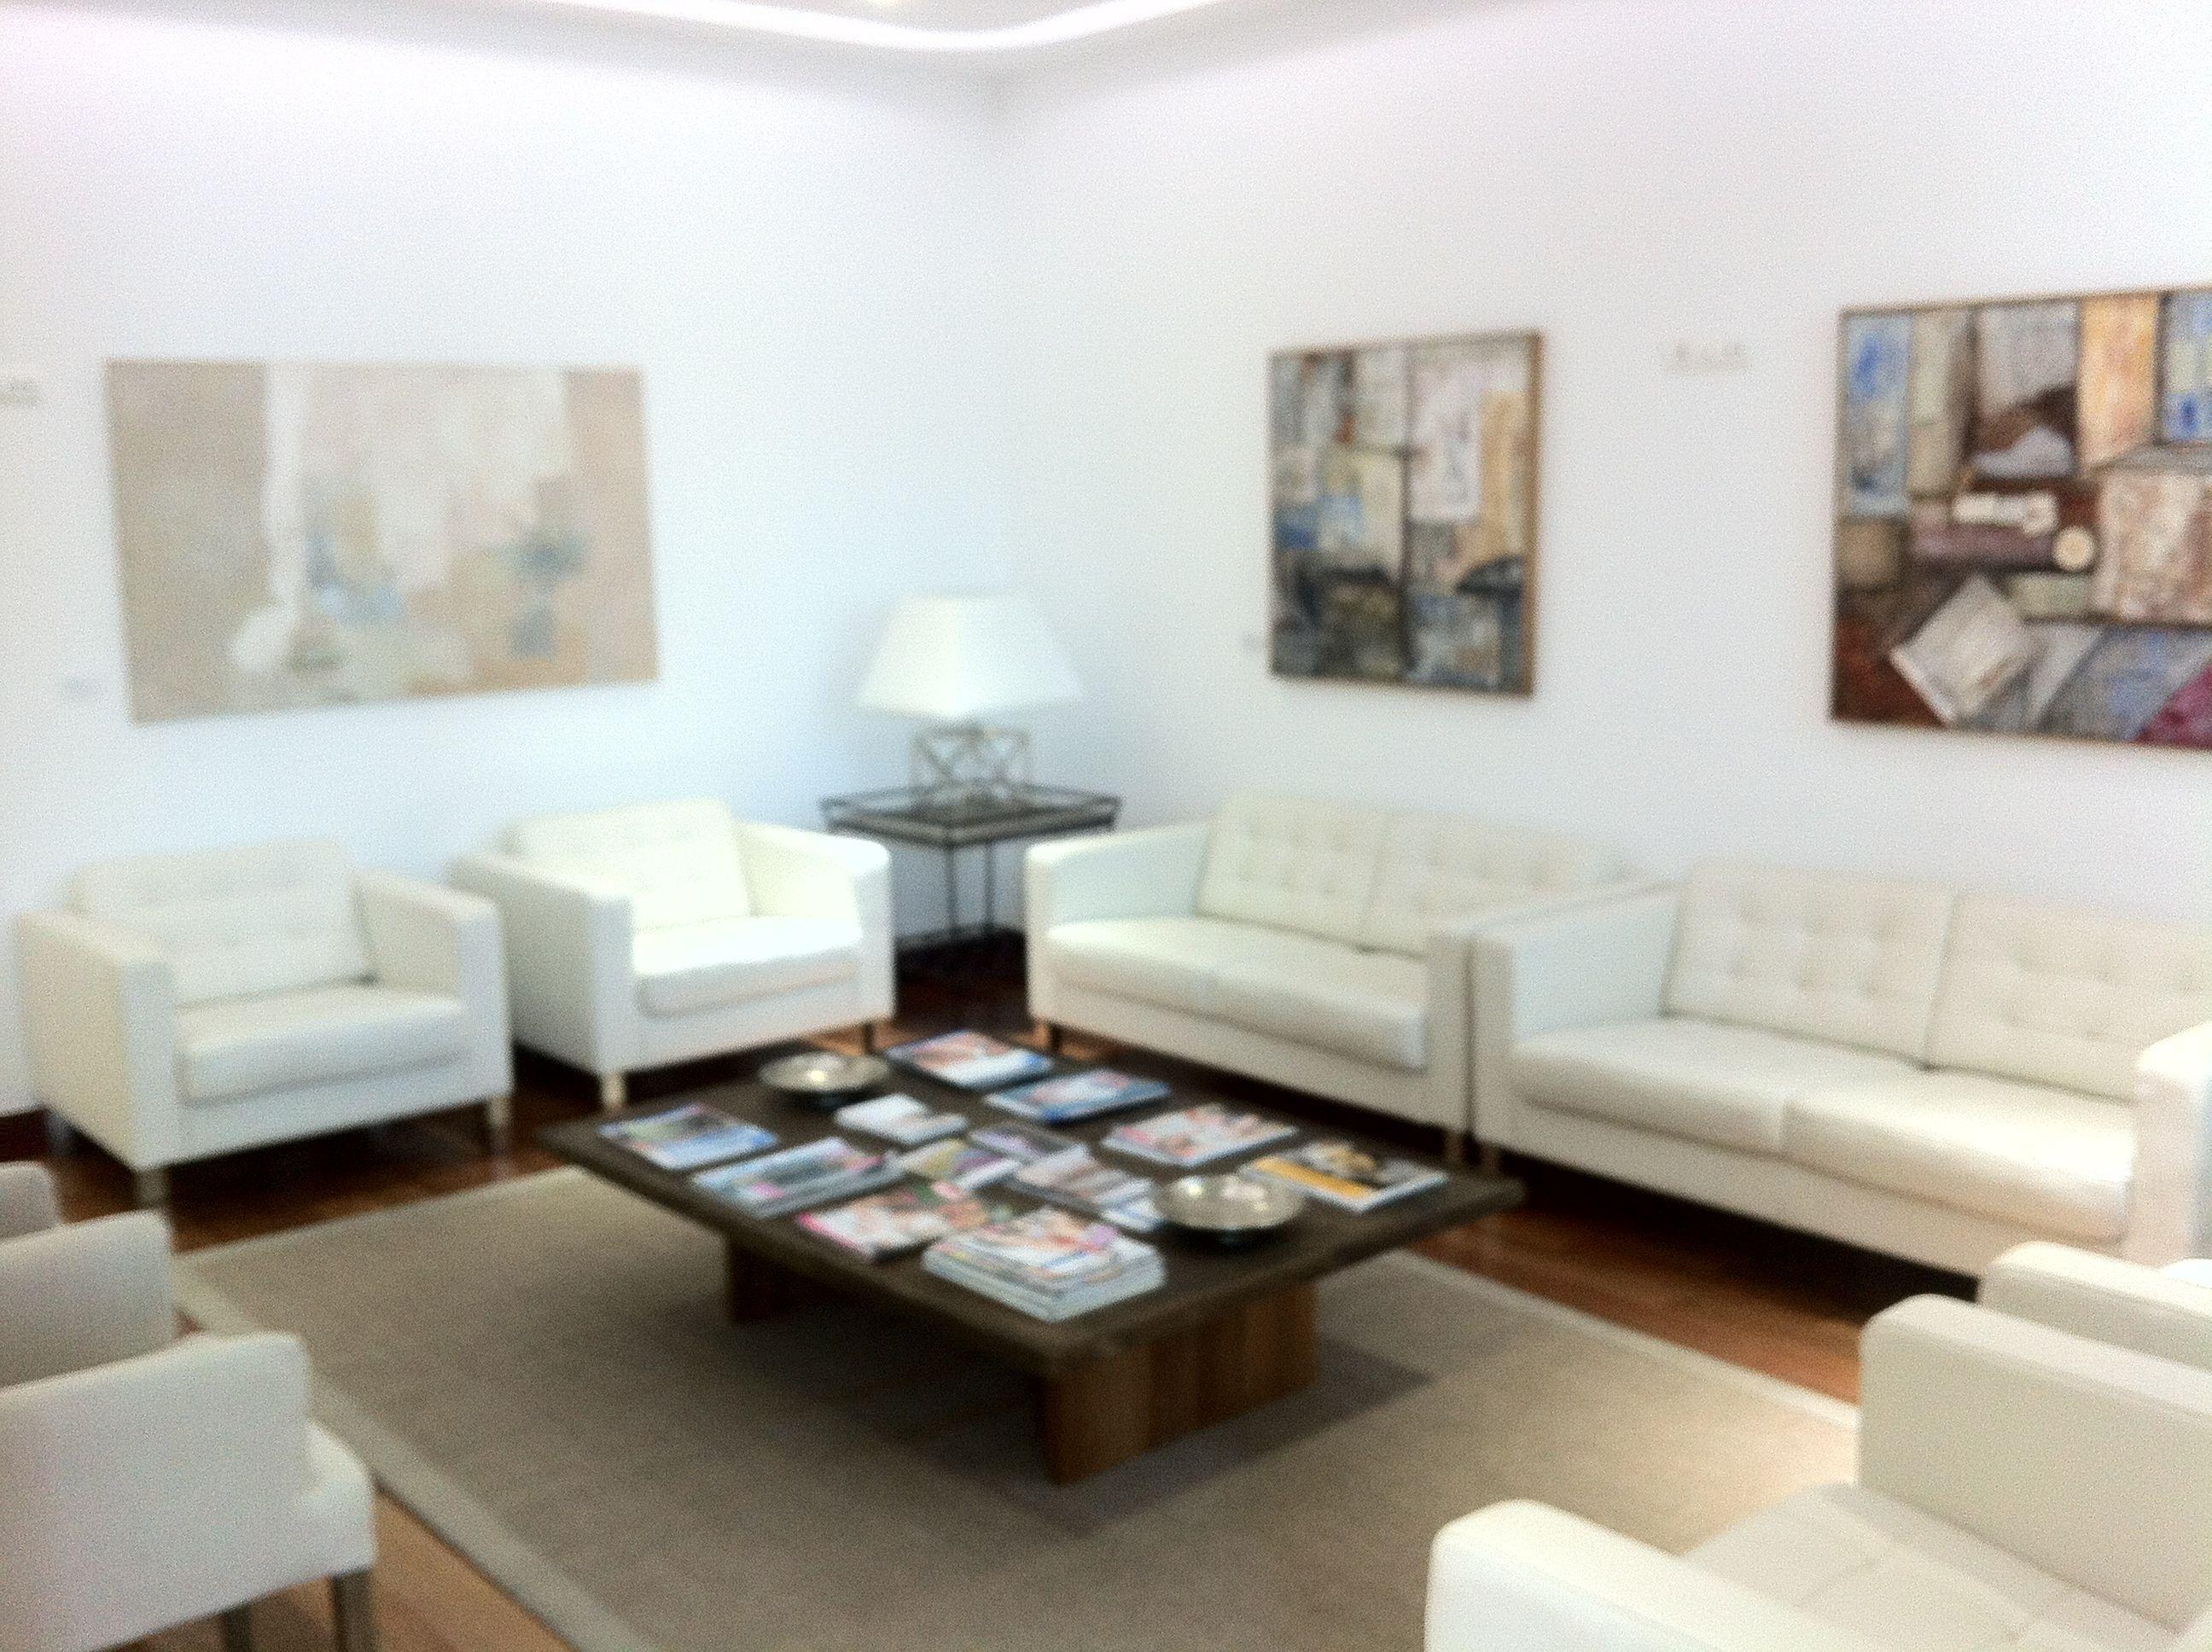 Sala de espera principal clinica dental consultorios pinterest salas de espera clinica - Muebles para sala de espera ...